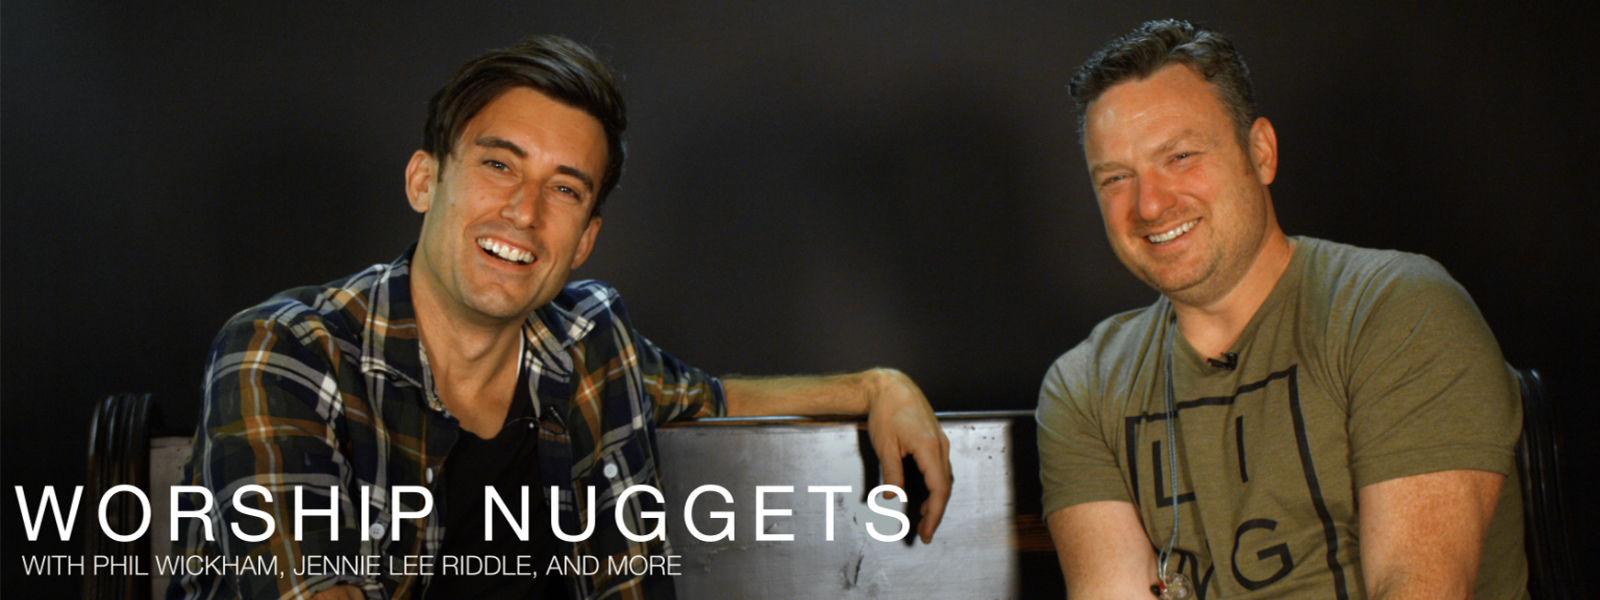 Worship Nuggets